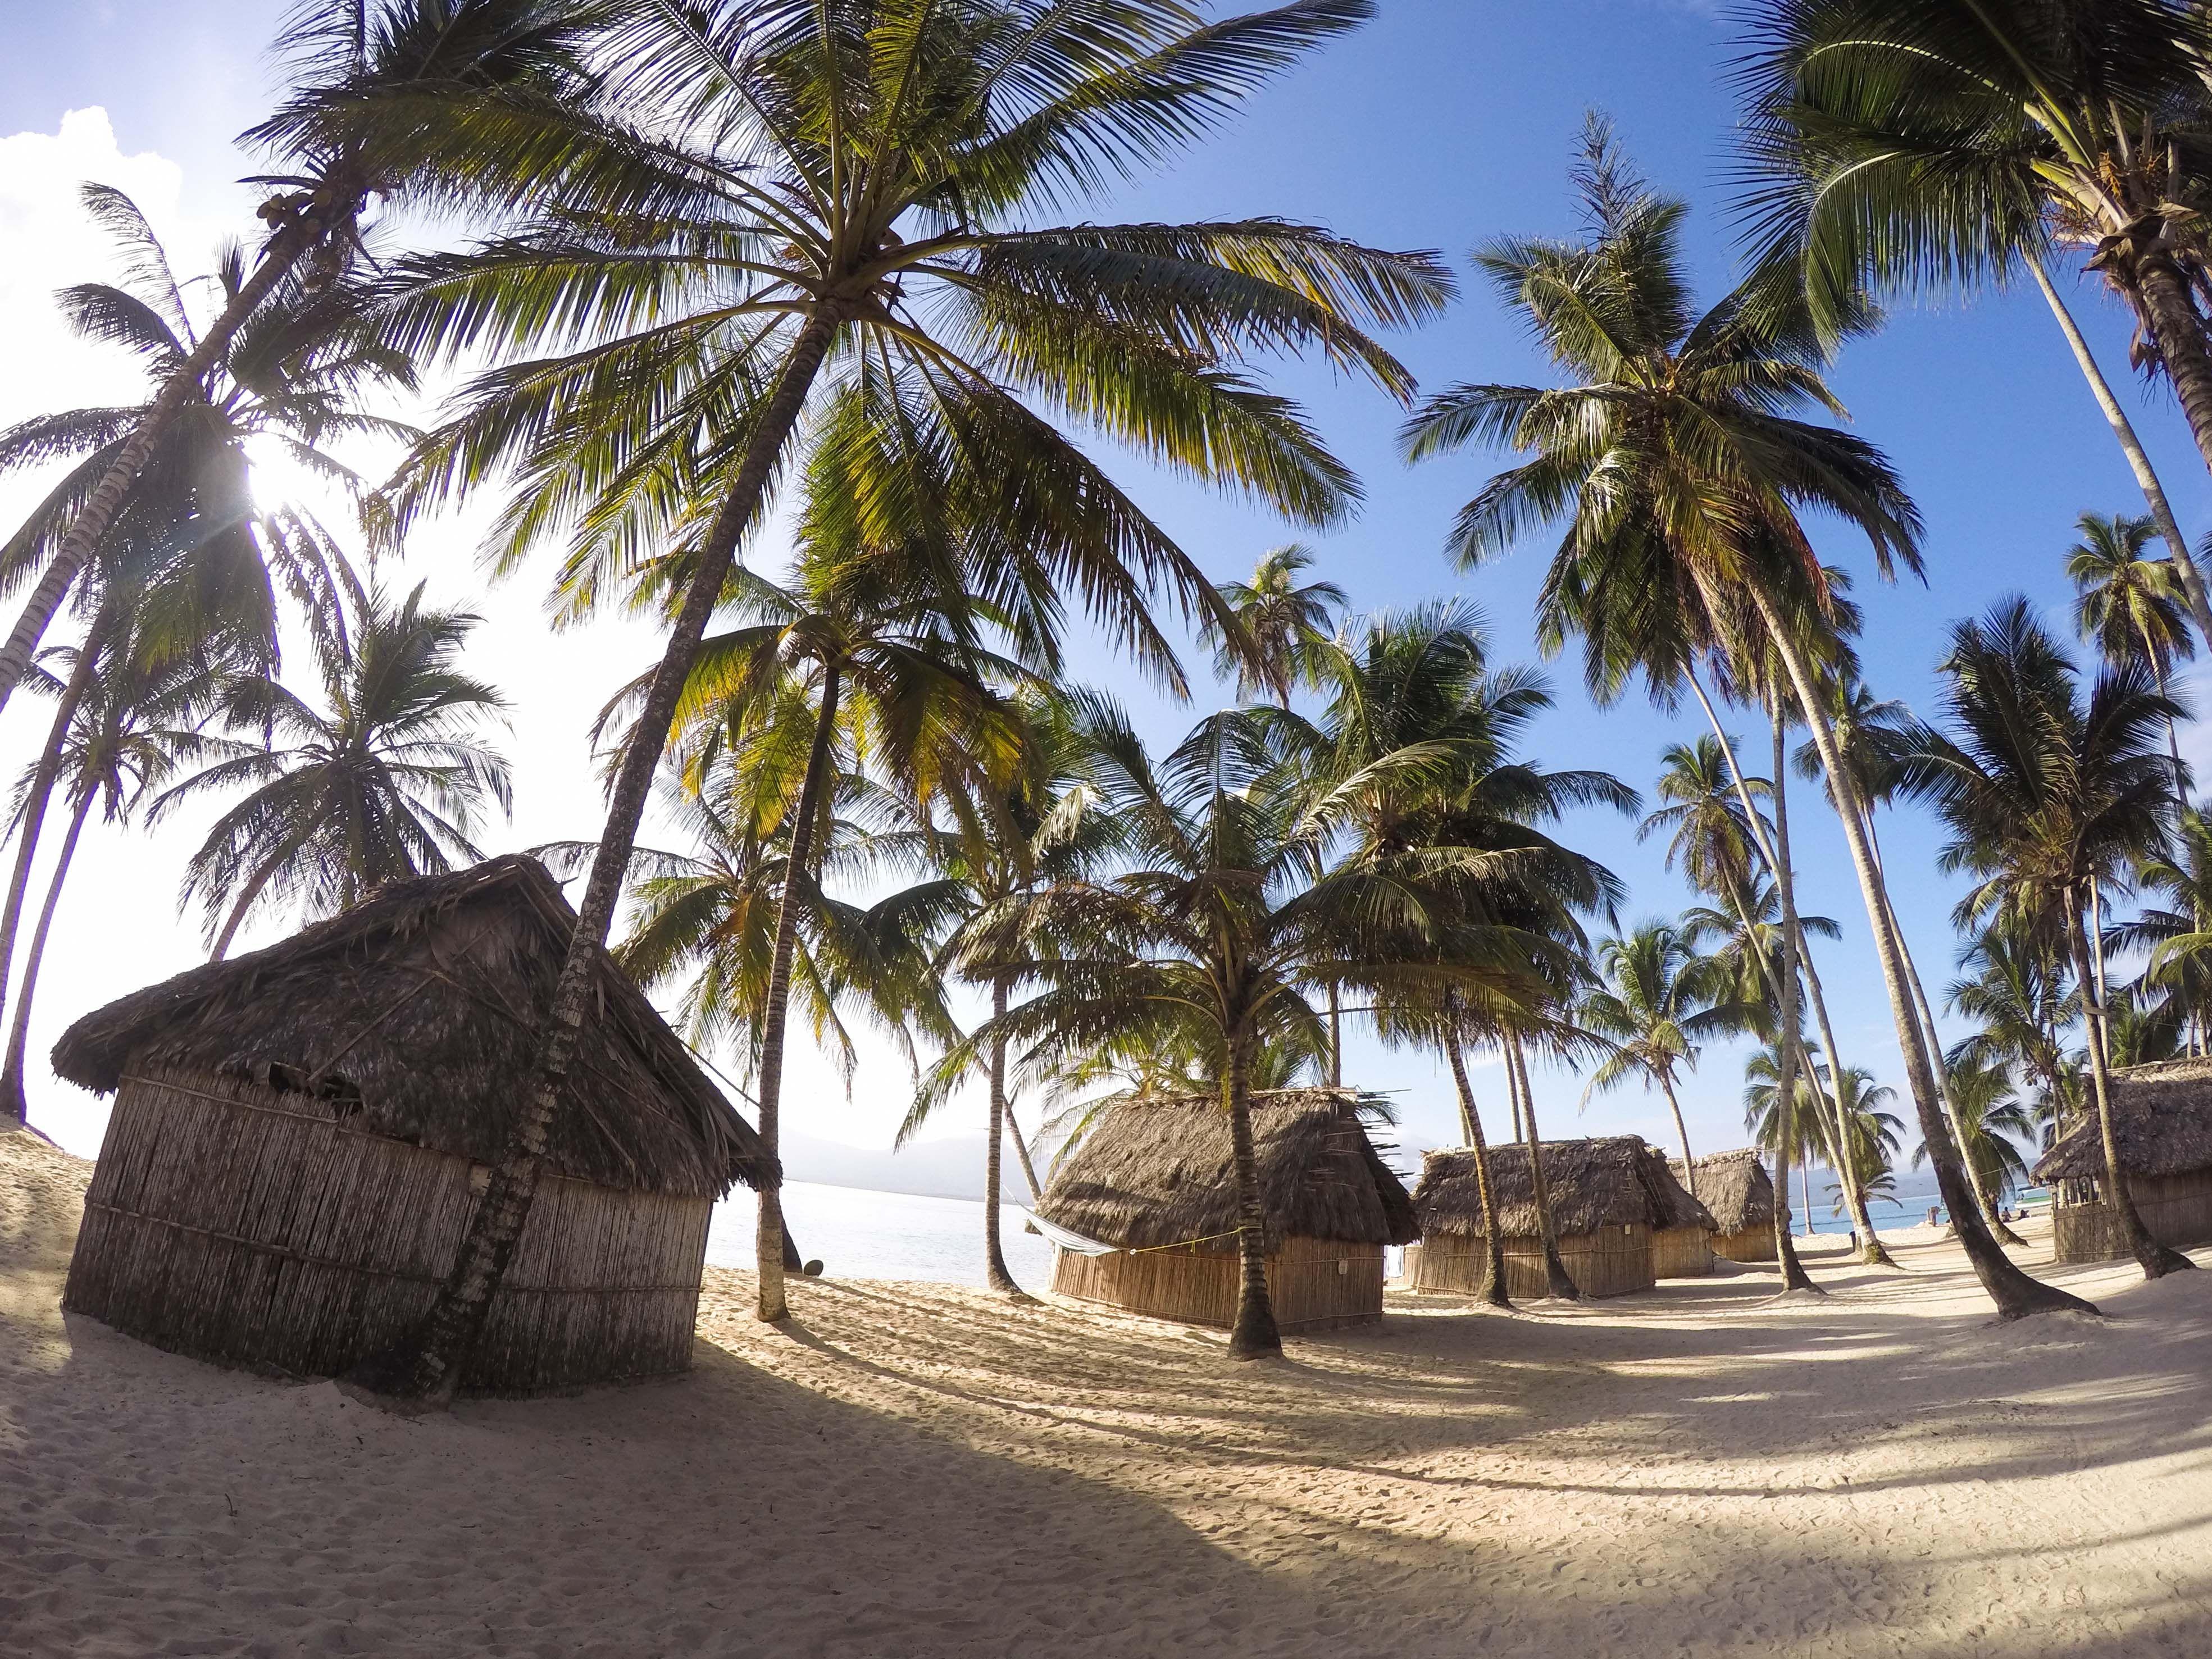 San Blas  Foto por: Monique Renne  #melhoresdestinos #viagem #travel #viajar #panama #sanblas